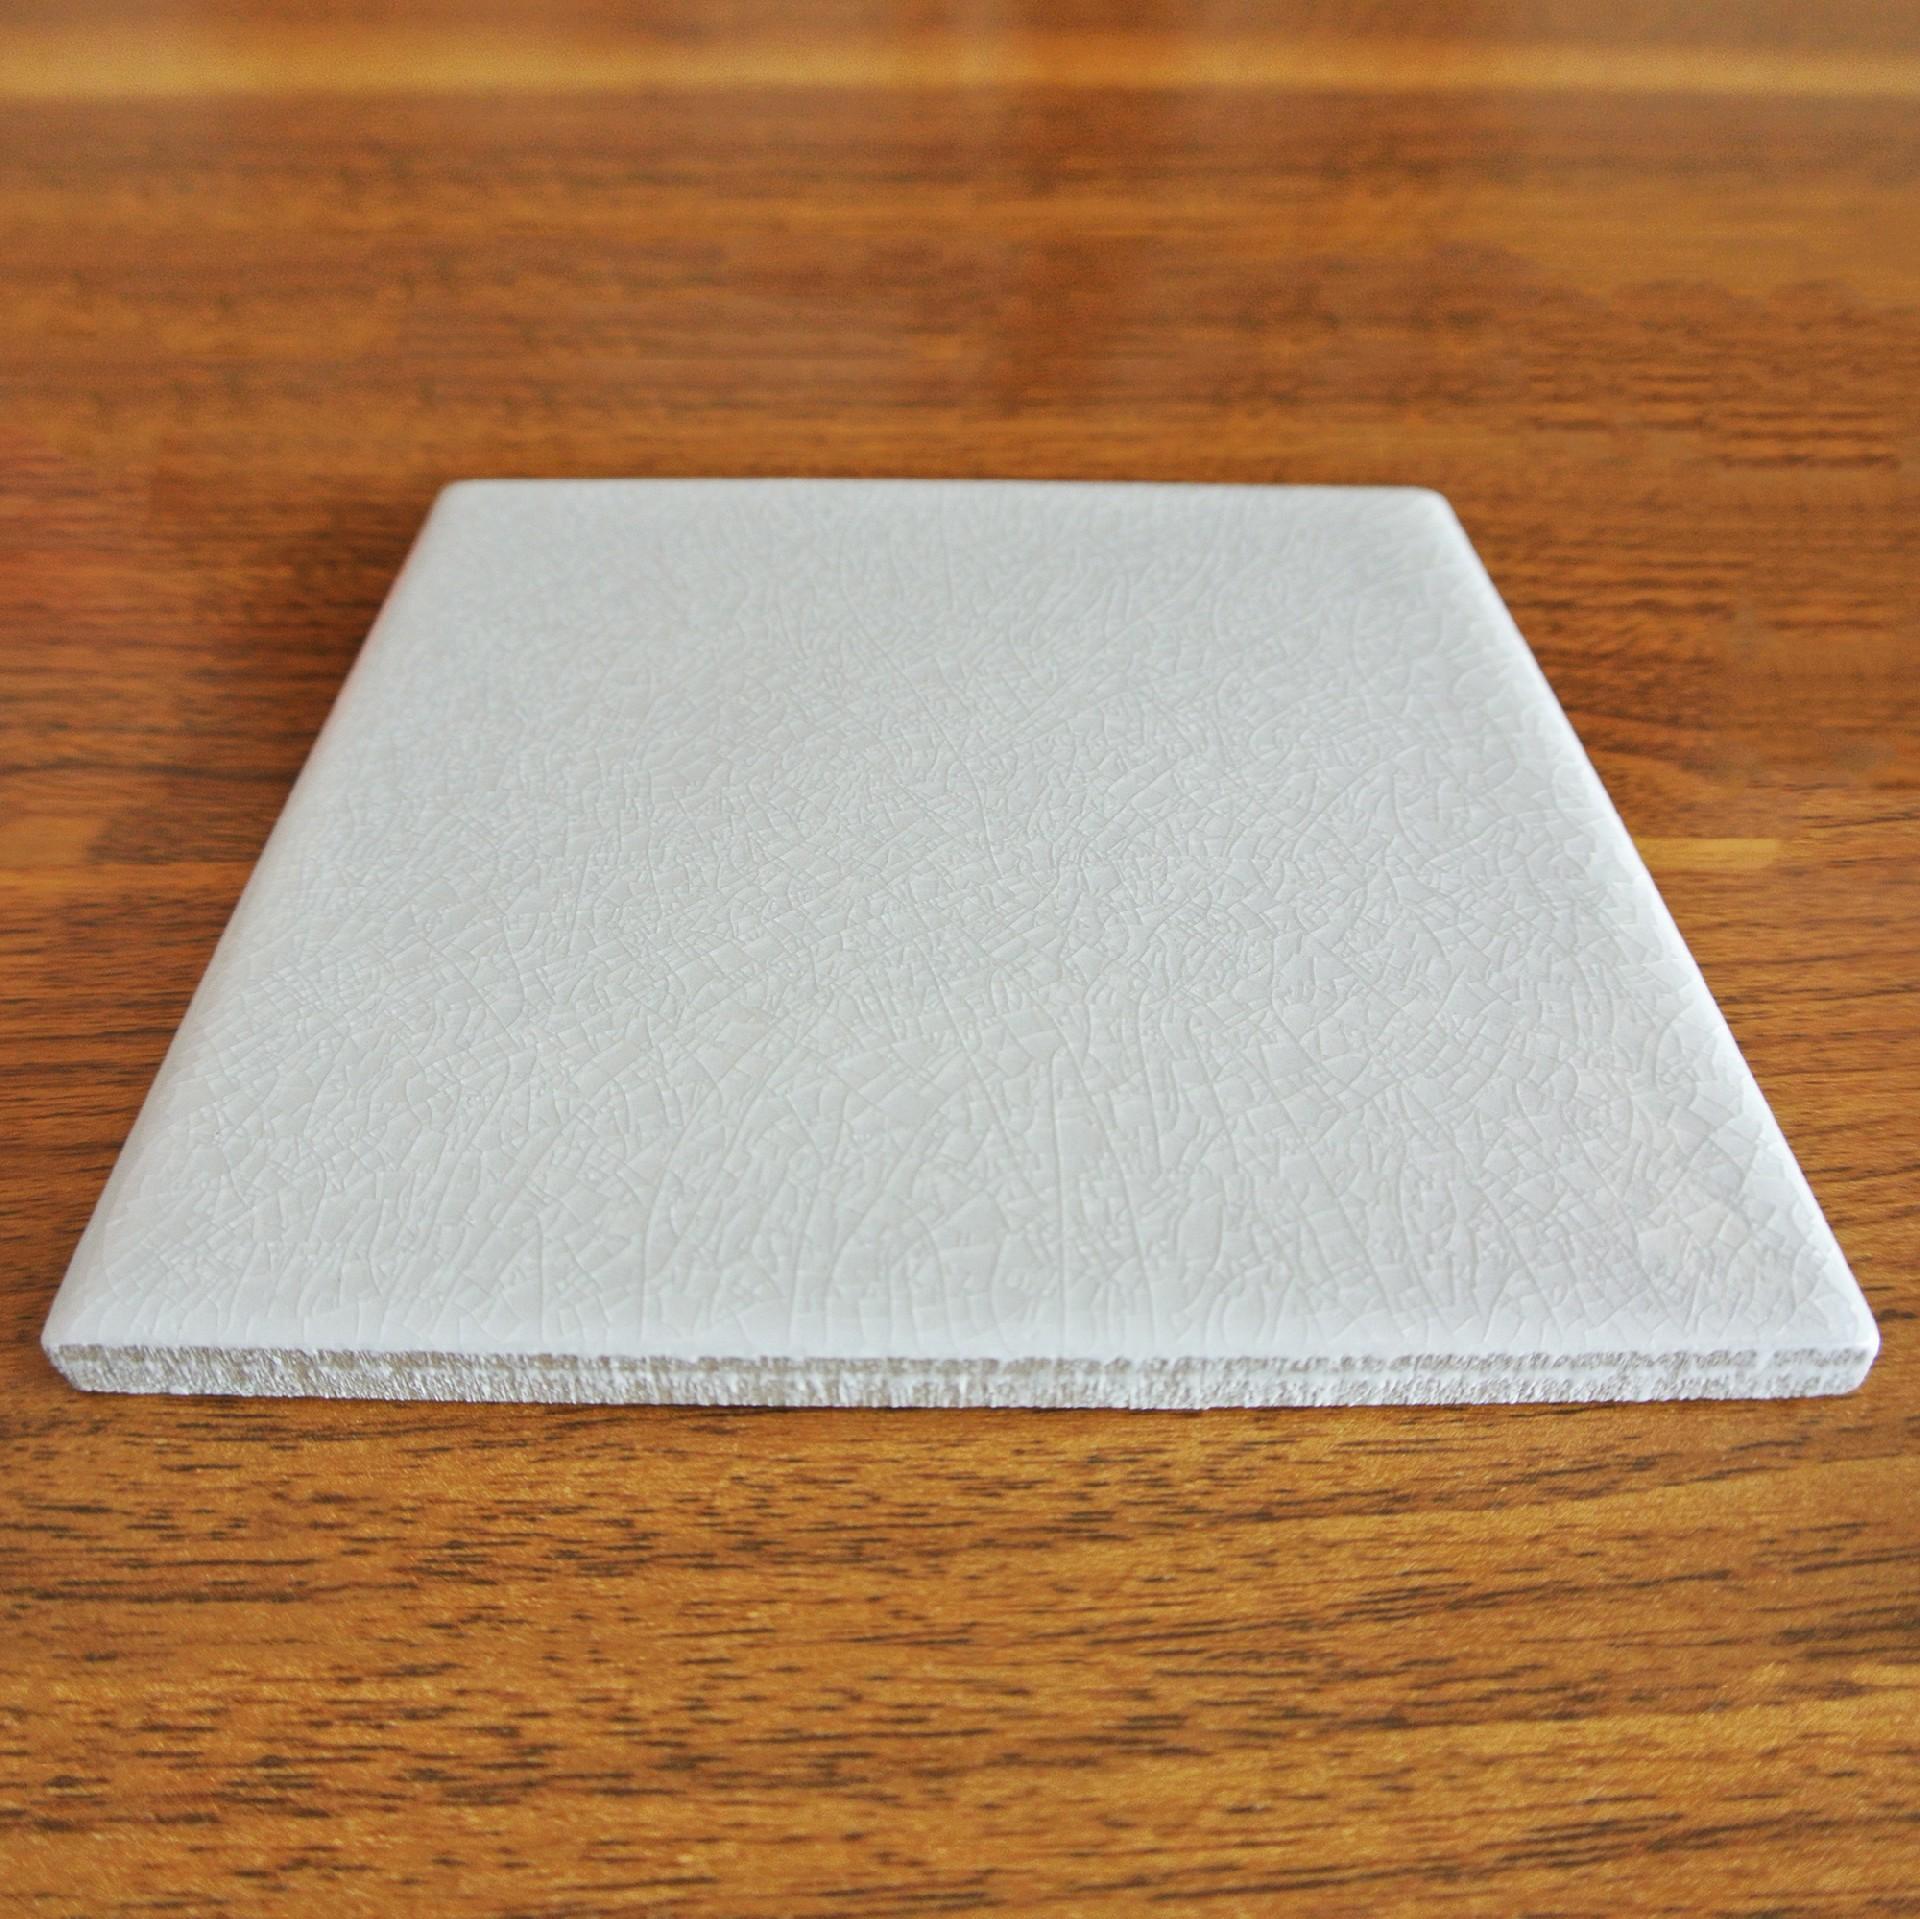 Cracking glaze tiles,sublimation